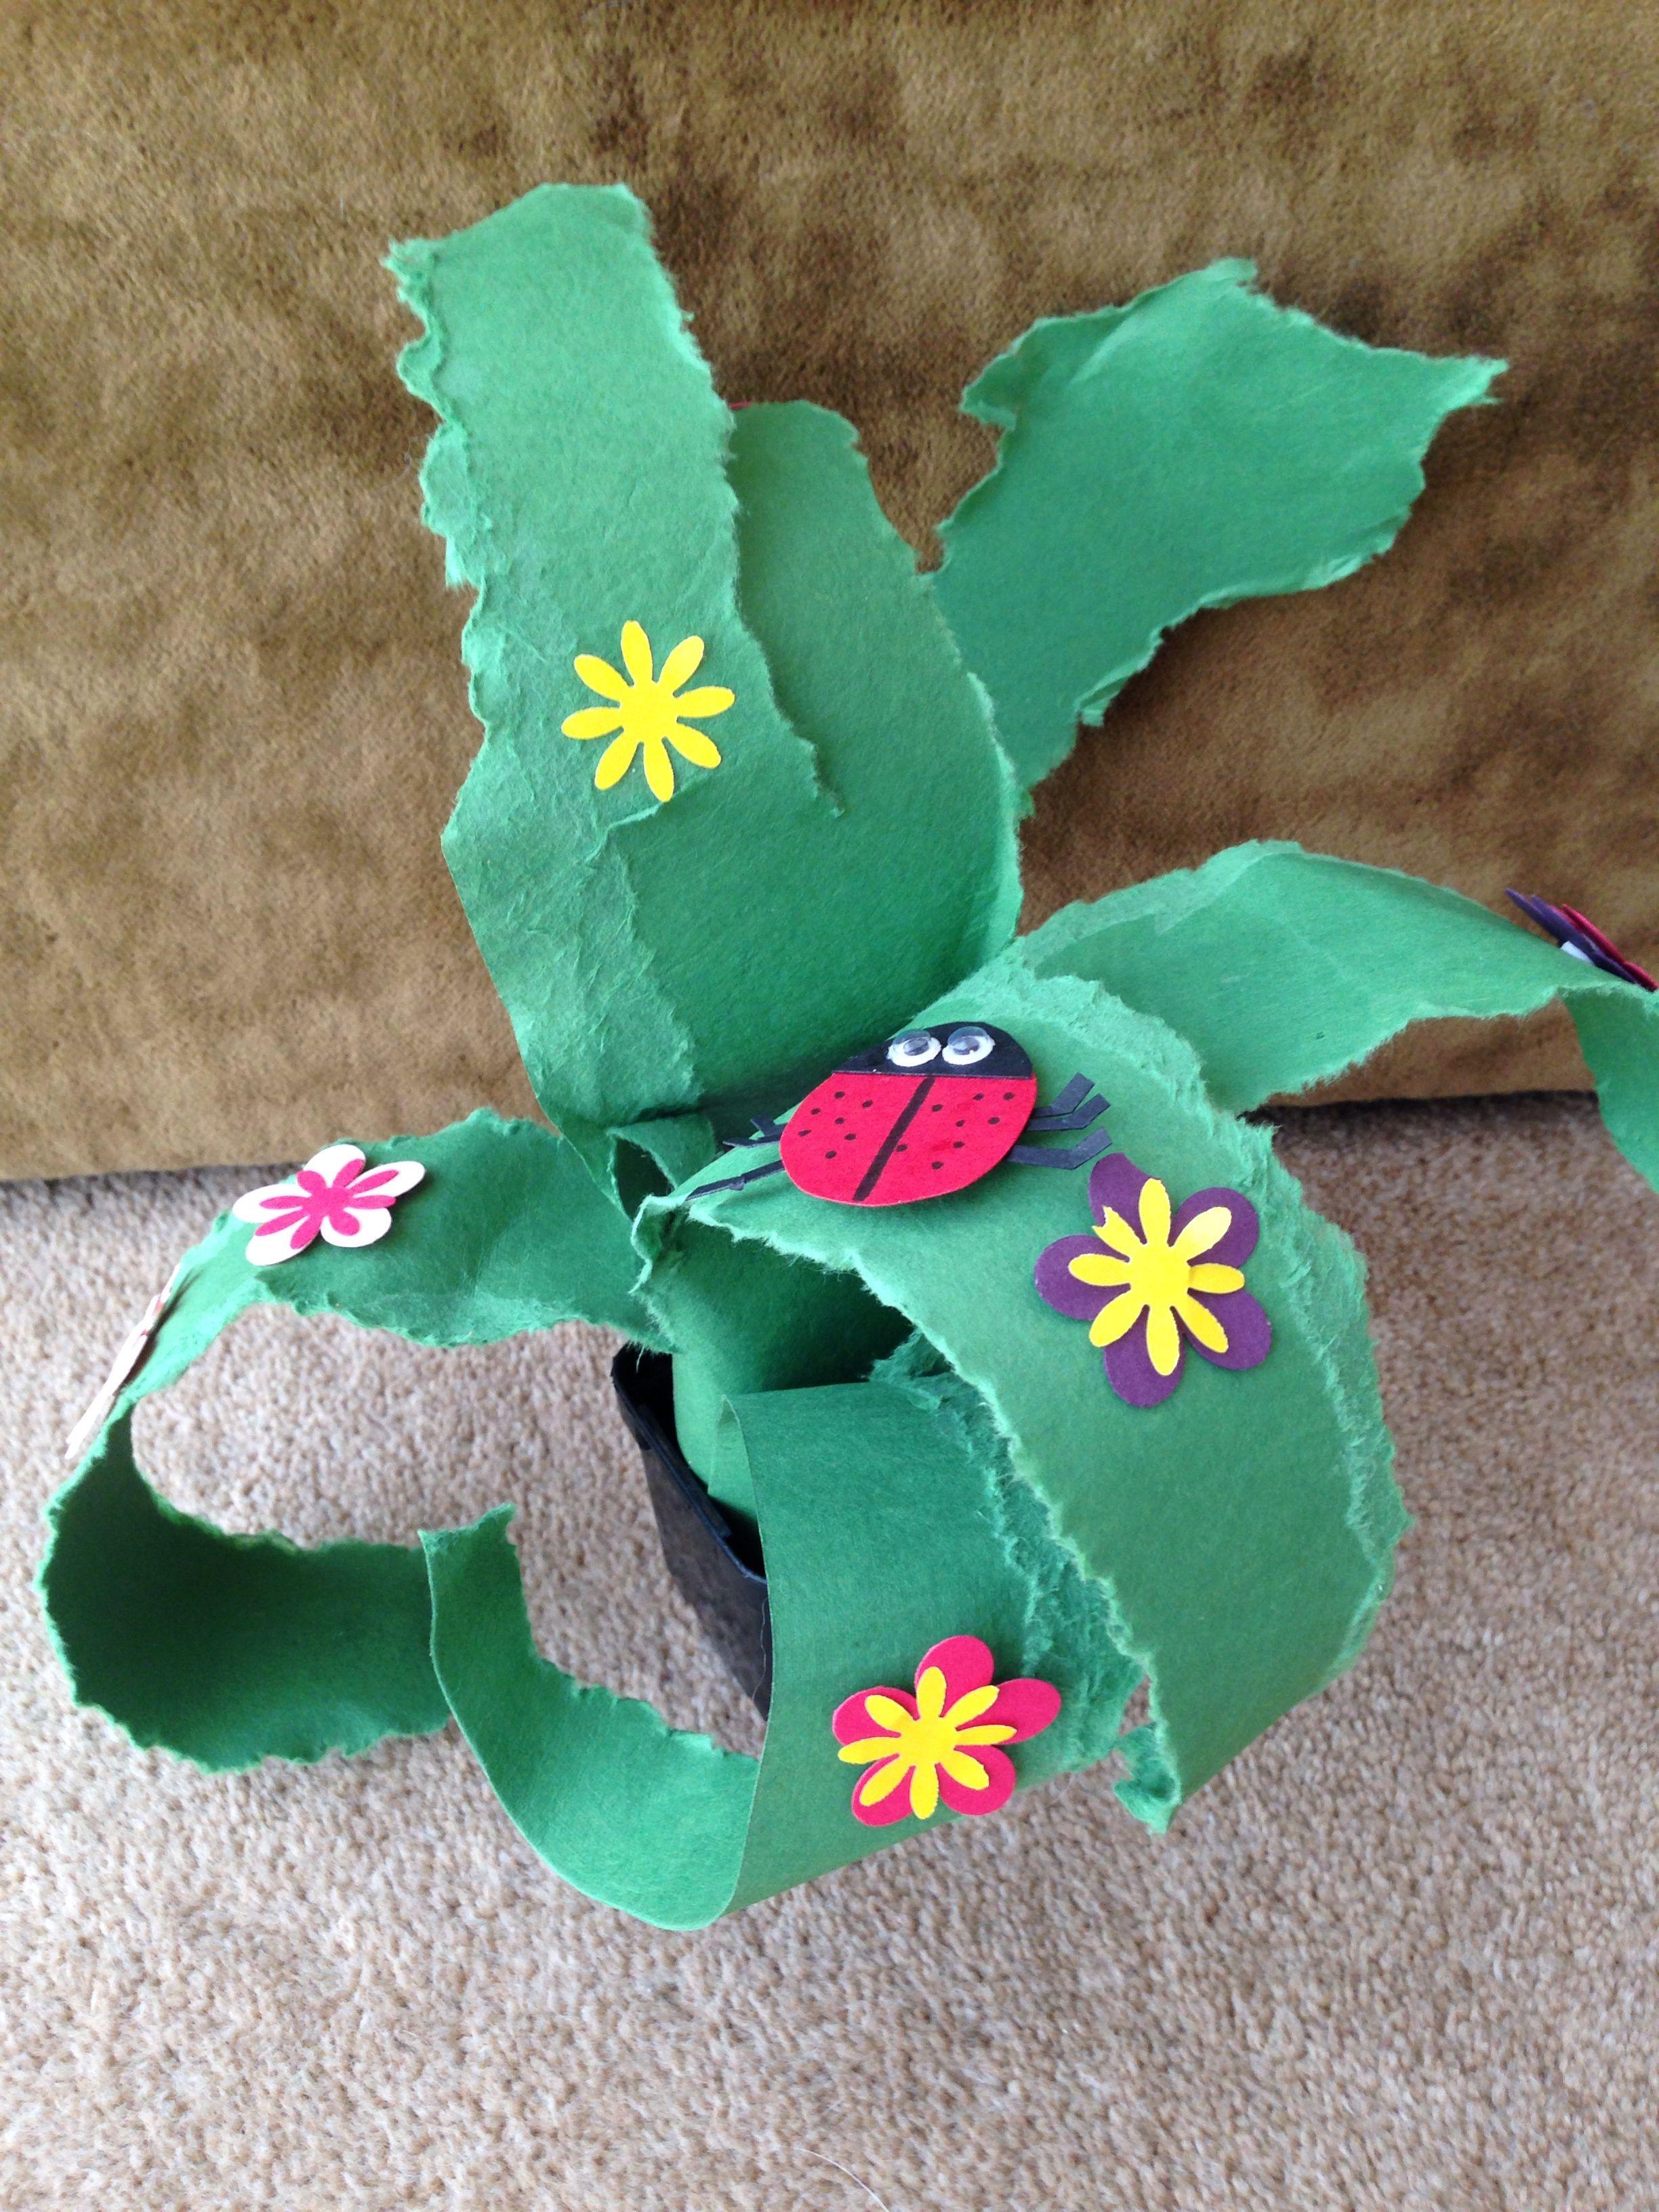 Miss E's version of Mr Maker's paper plant